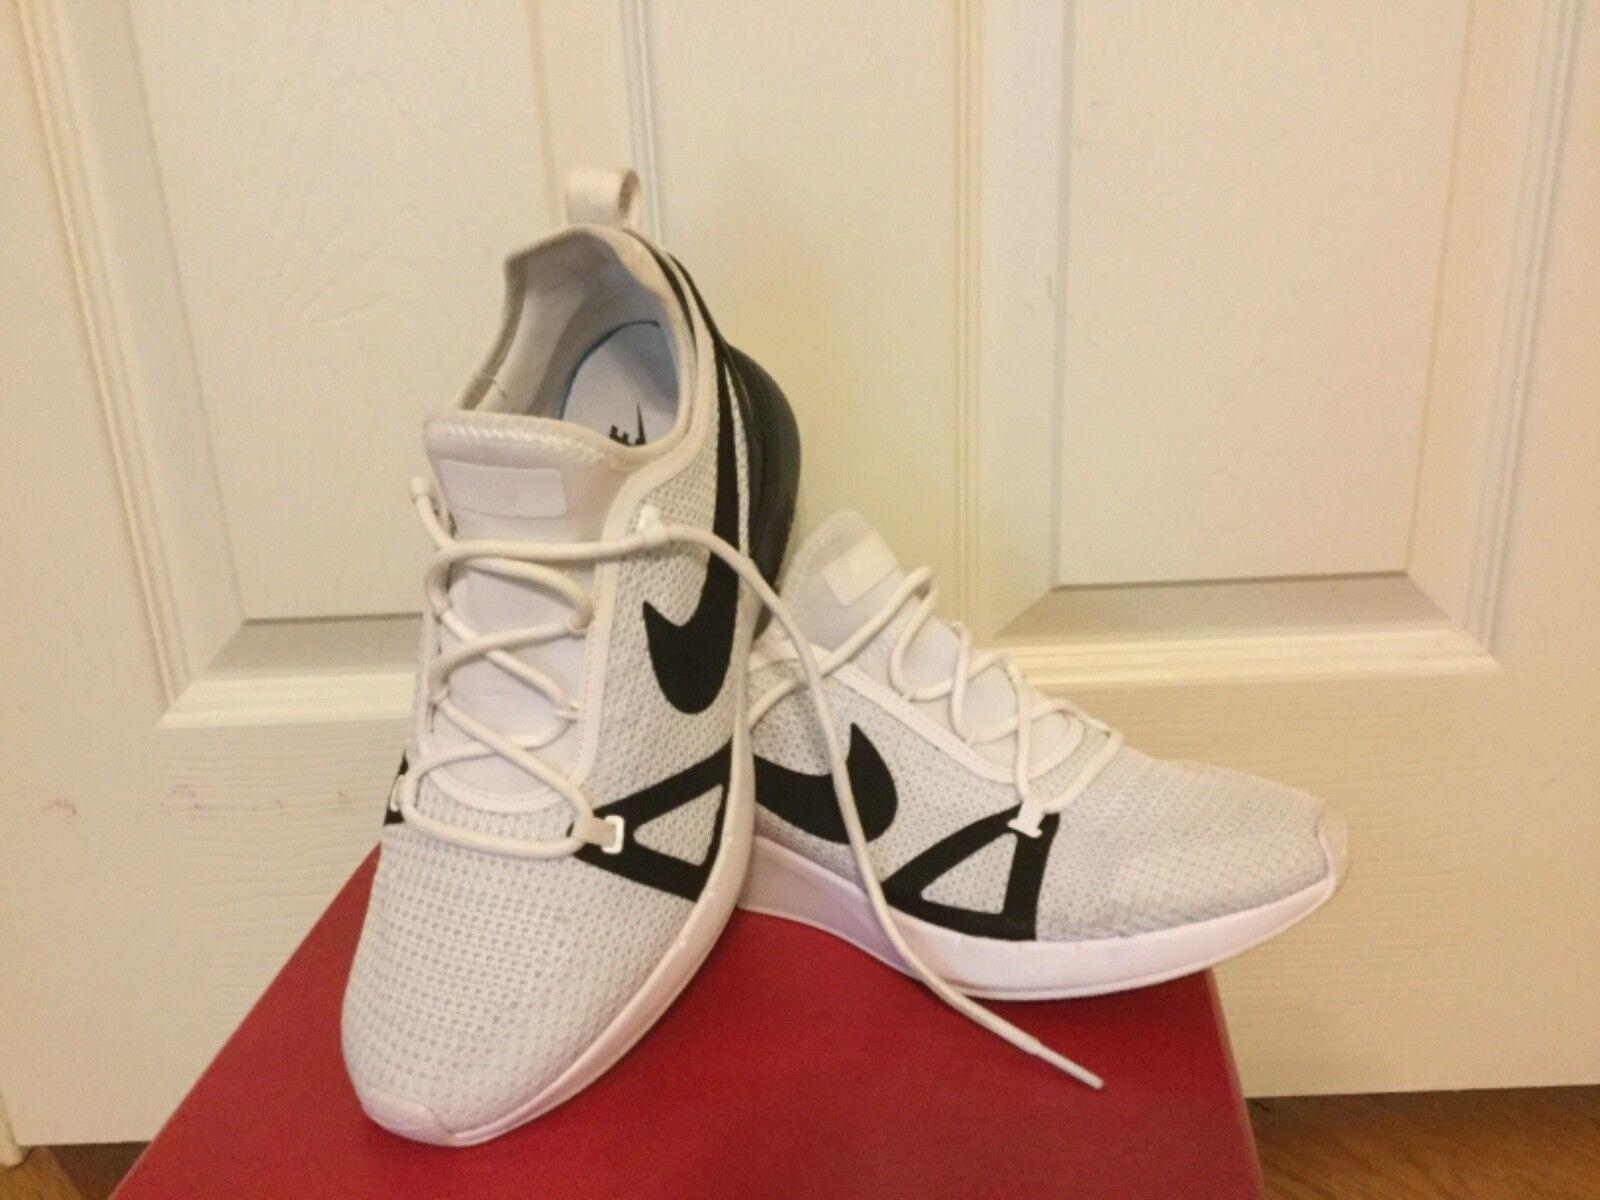 Brand discount Nike Duel Racer 918228-102  White Black Men's Sportswear Running Shoes NEW!